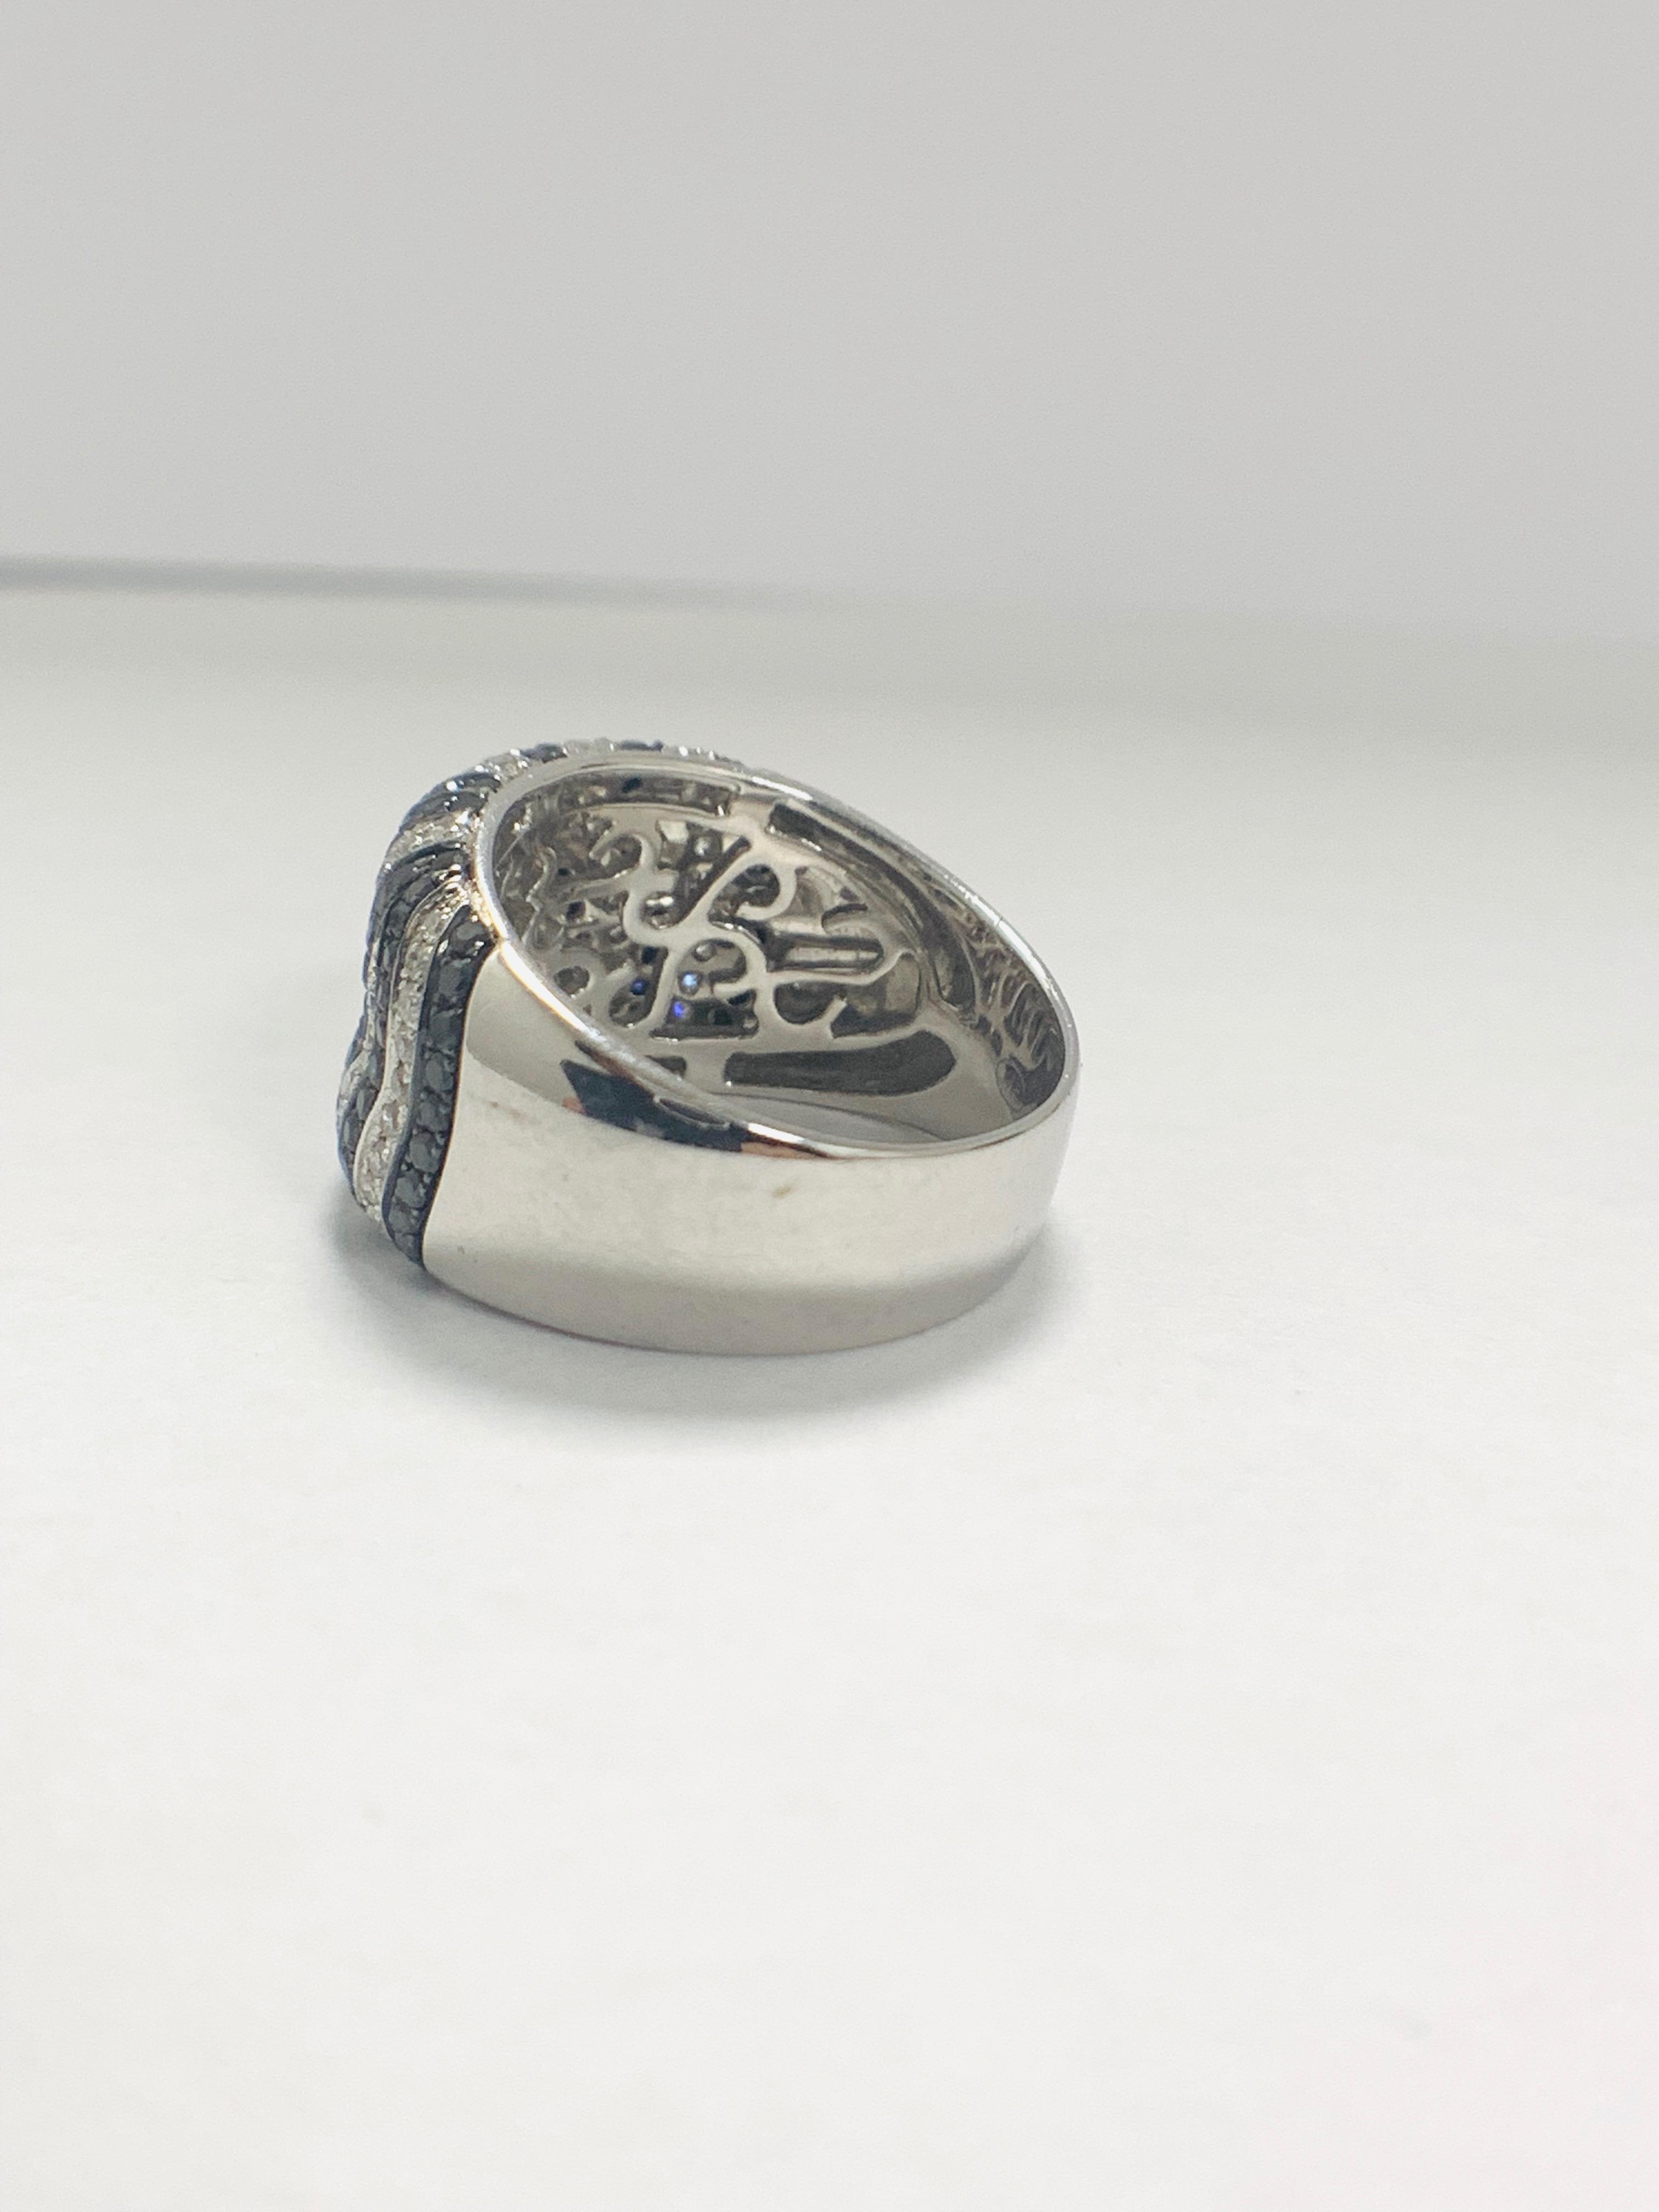 18ct White Gold Diamond ring - Image 4 of 14